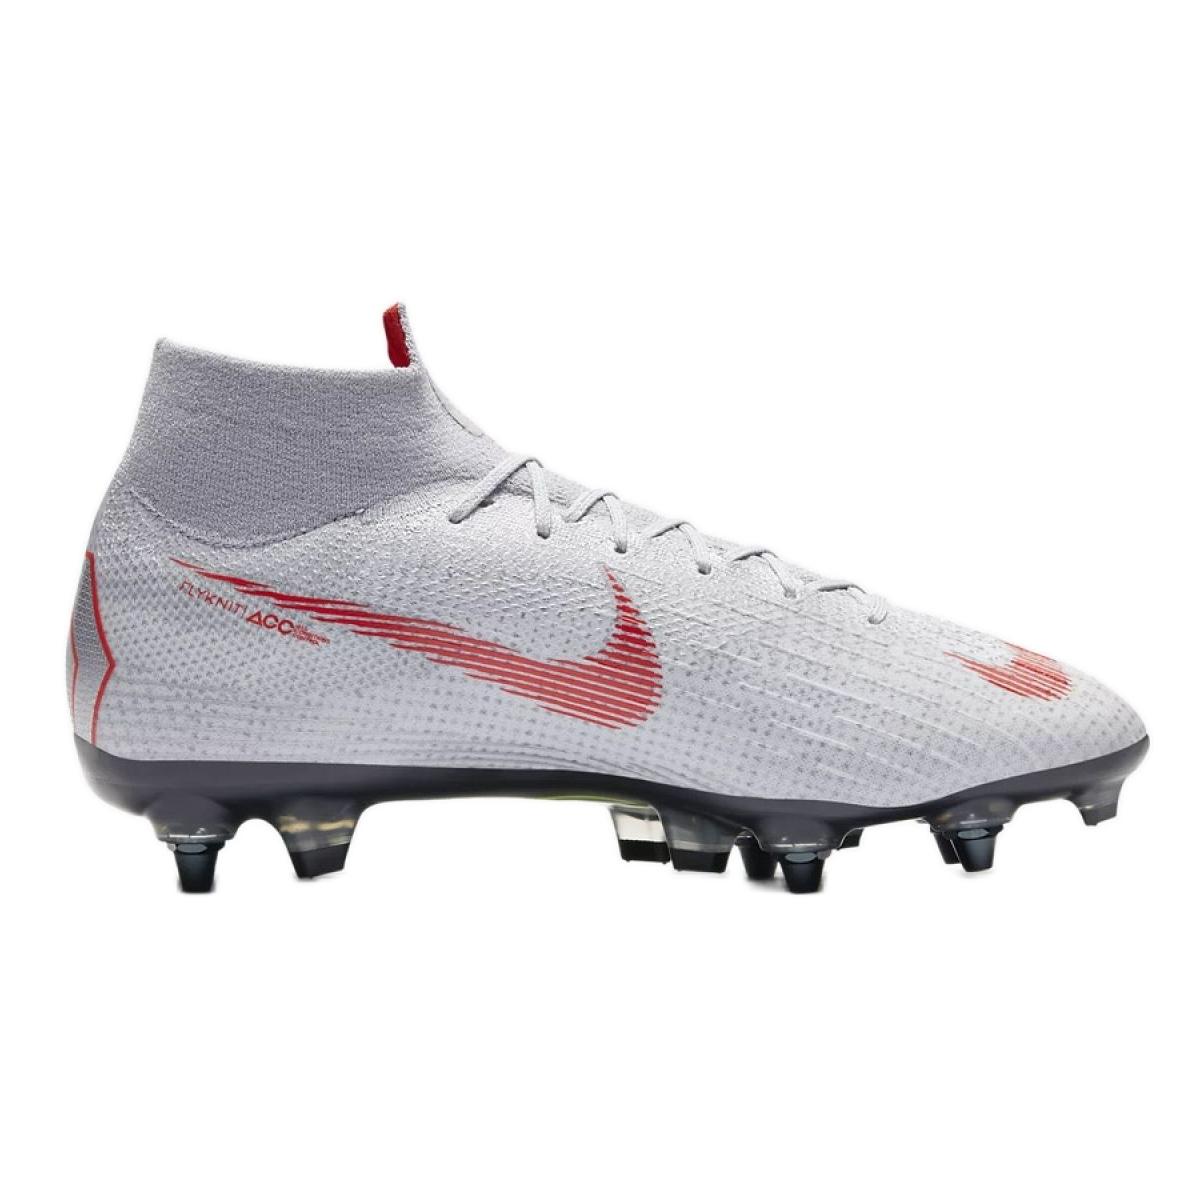 online store 400b9 fdca2 Football shoes Nike Mercurial Superfly 6 Elite SG-Pro M AH7366-060